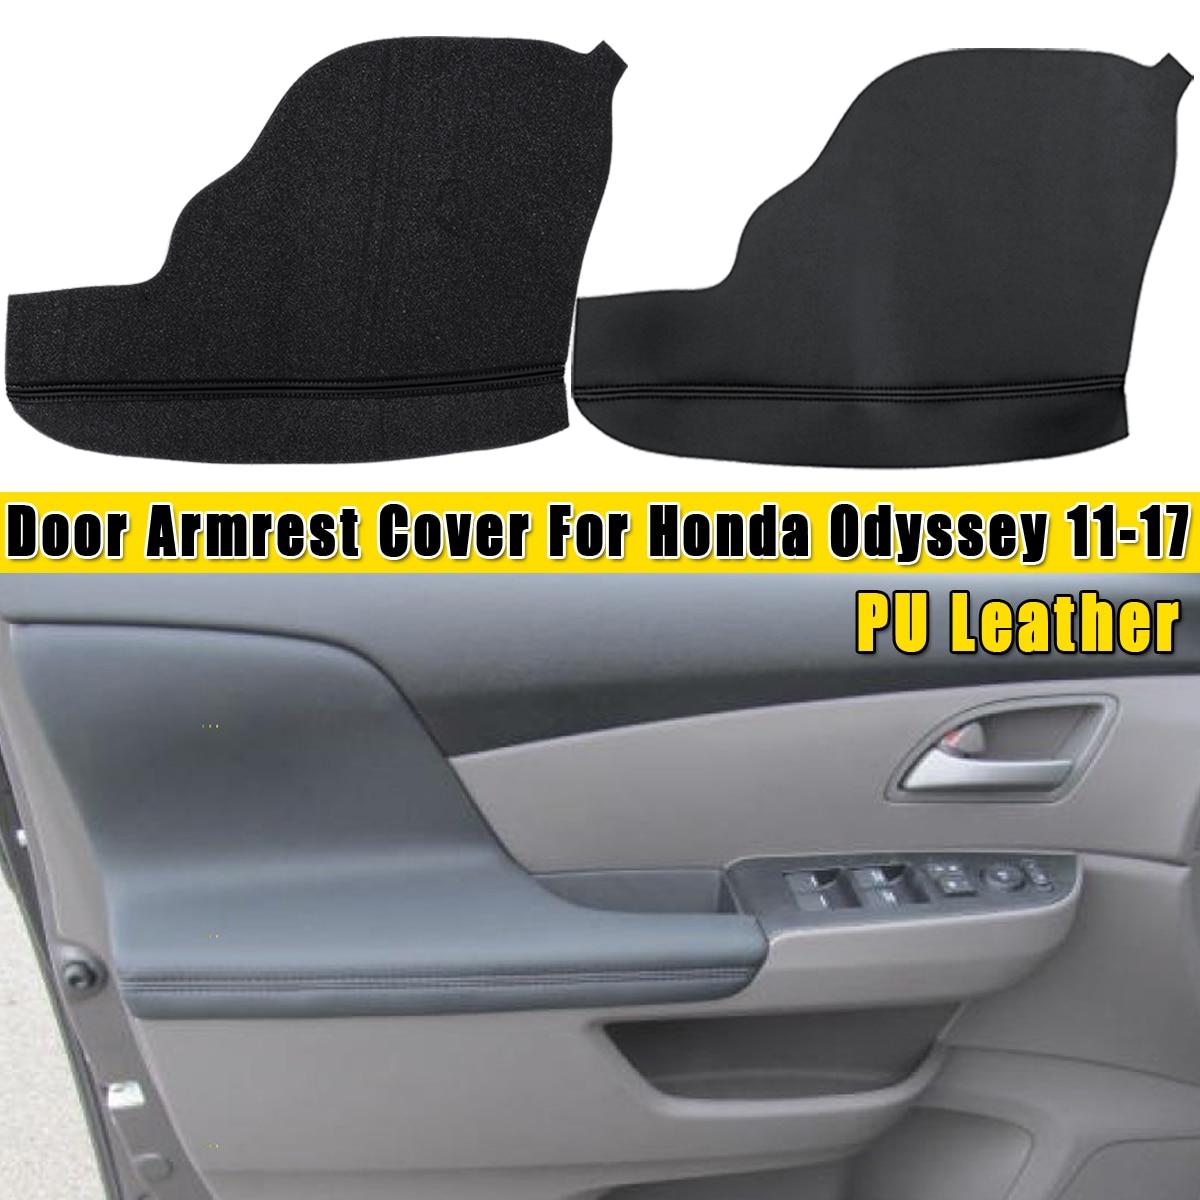 2pcs/set Door Armrest Upholstery Covers Leather For Honda For ODYSSEY 2011 2012 2013 2014 2015 2016 2017 Gray/Black/Beige